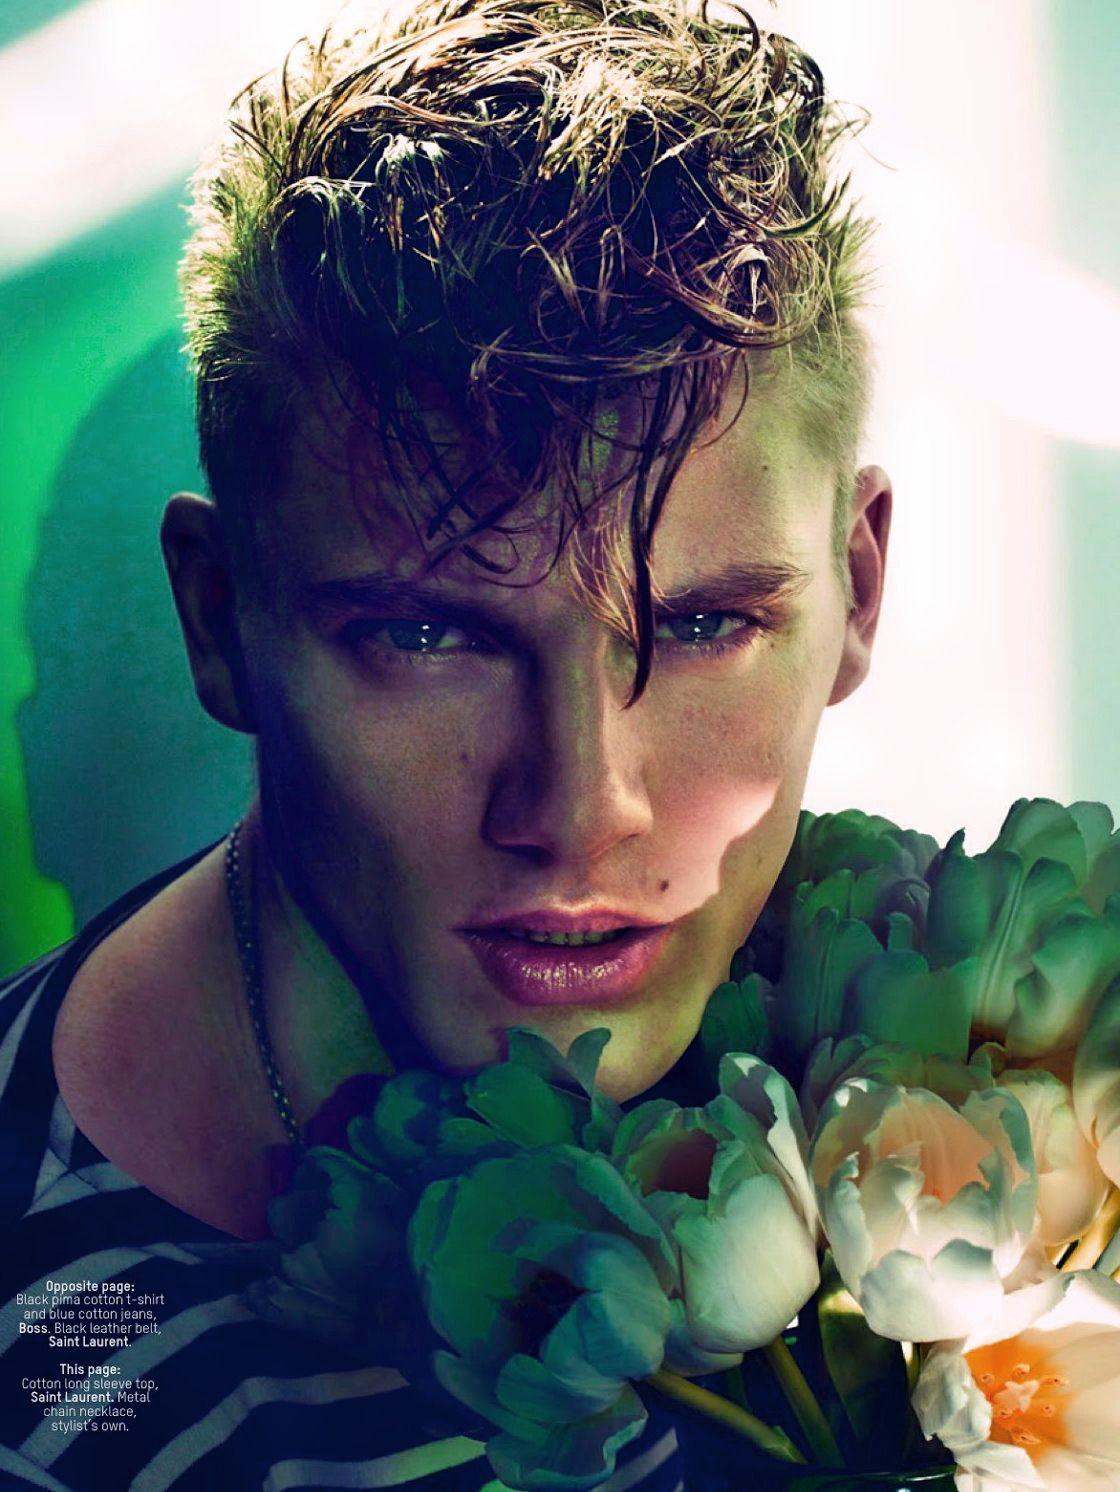 , #handsome #maleportrait in The Wild Ones by ChuanDo  /// #malefaces #handsomemen #beautyofmen, Hot Models Blog 2020, Hot Models Blog 2020